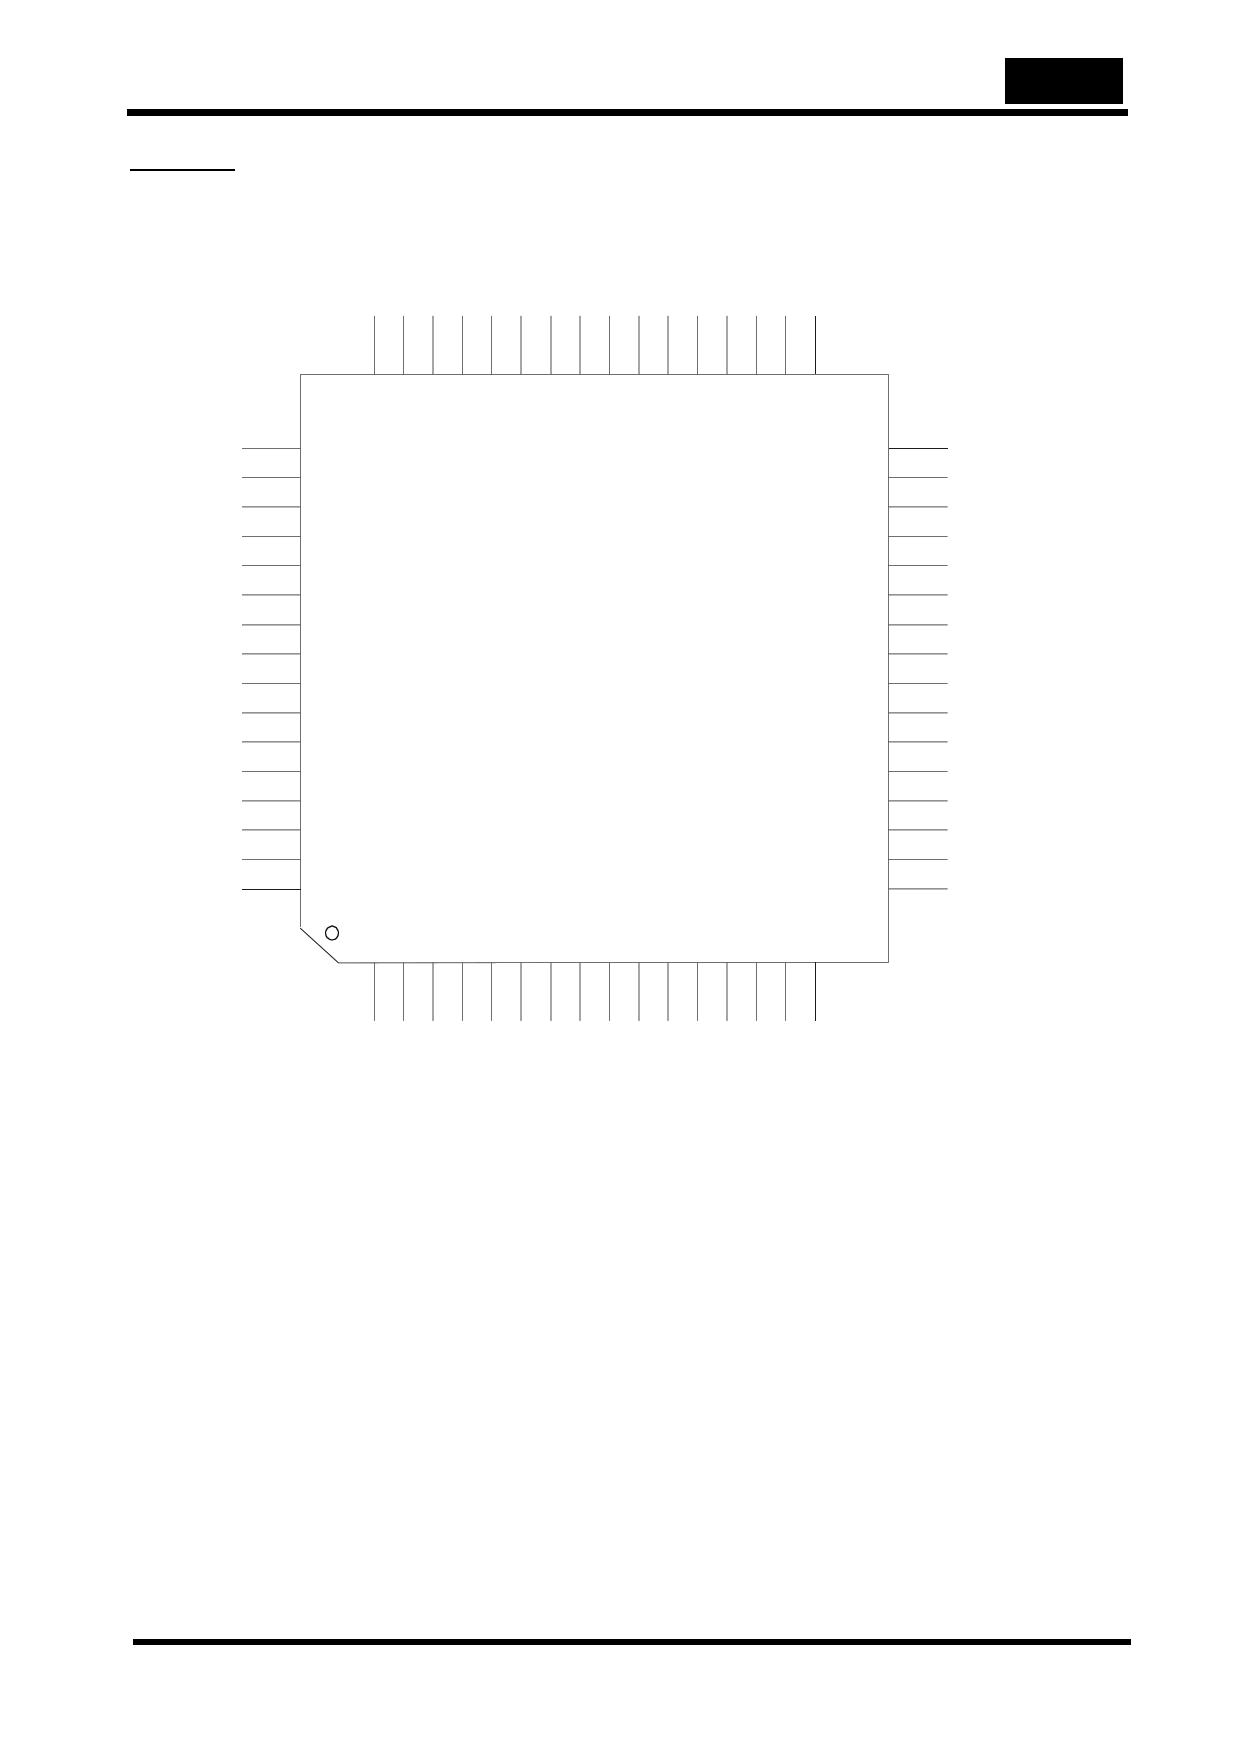 THC63LVD104A pdf, equivalent, schematic